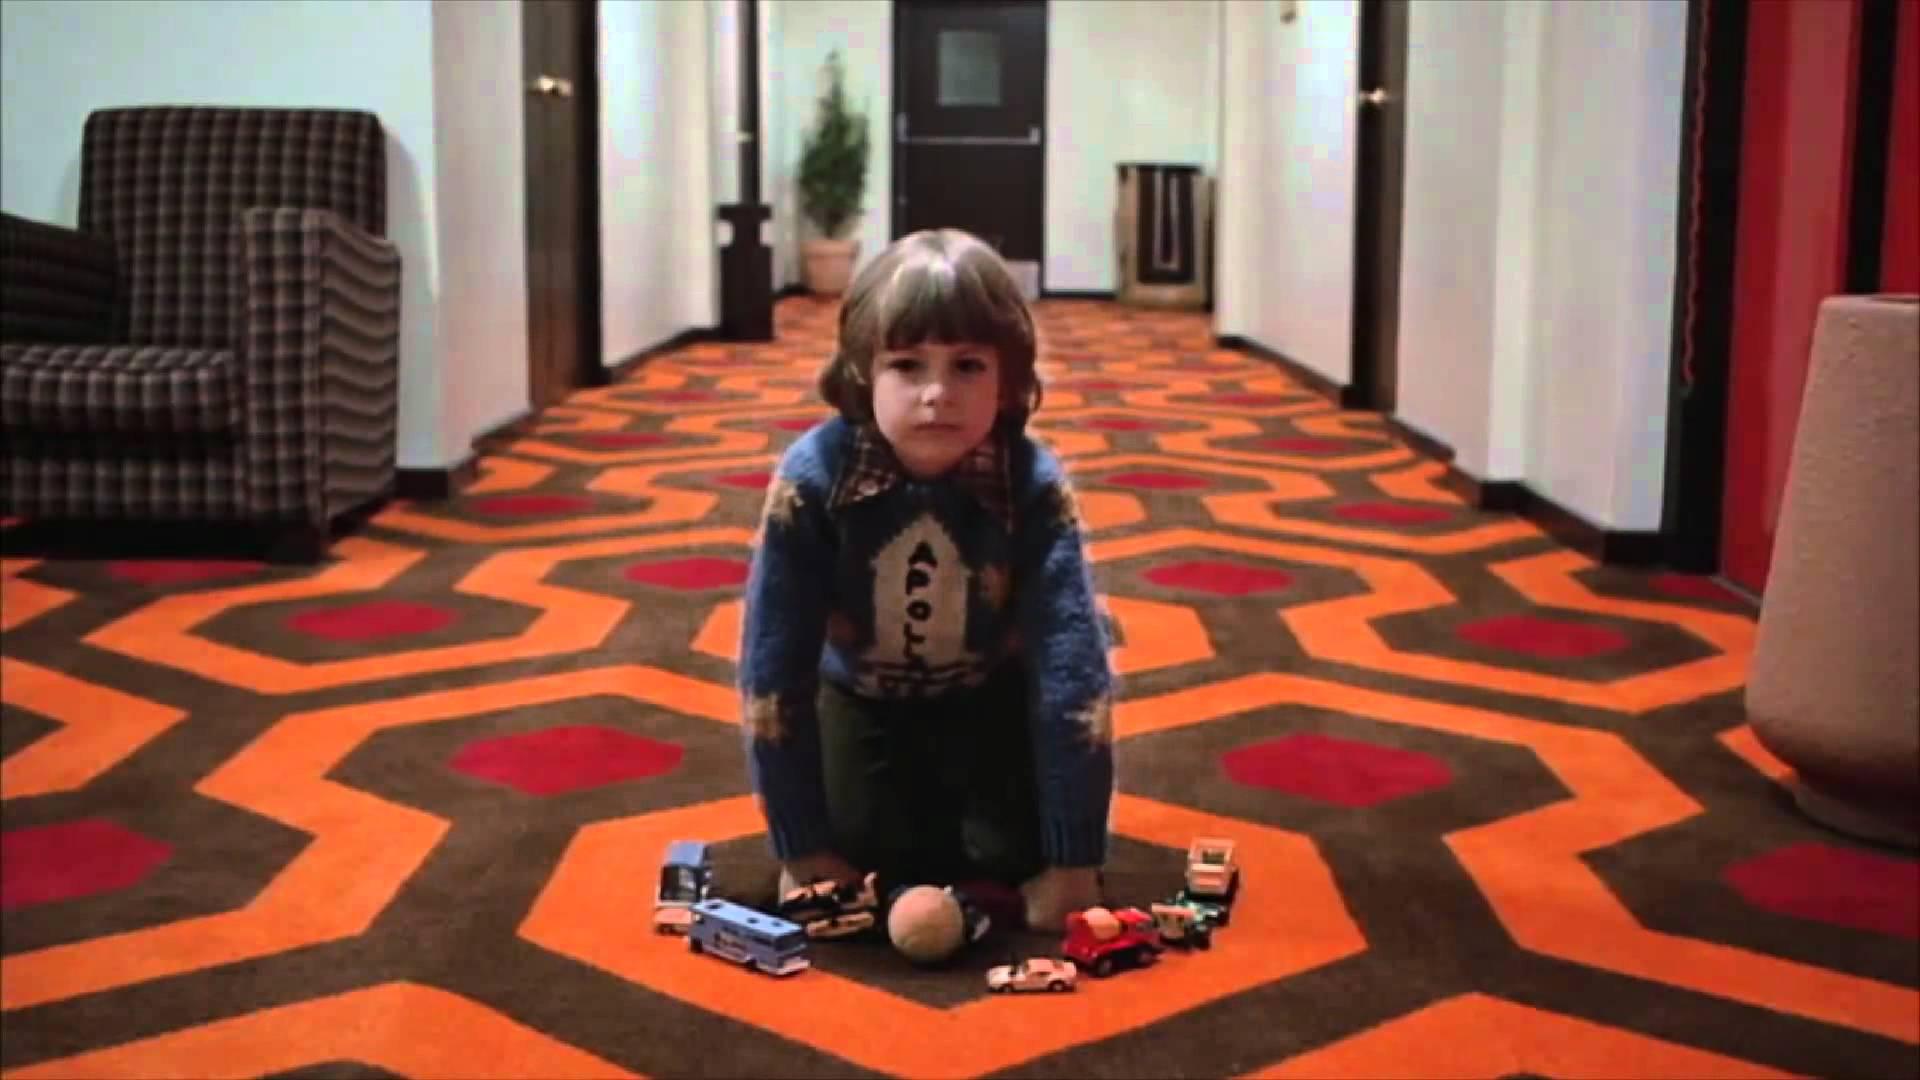 visually stunning horror movies